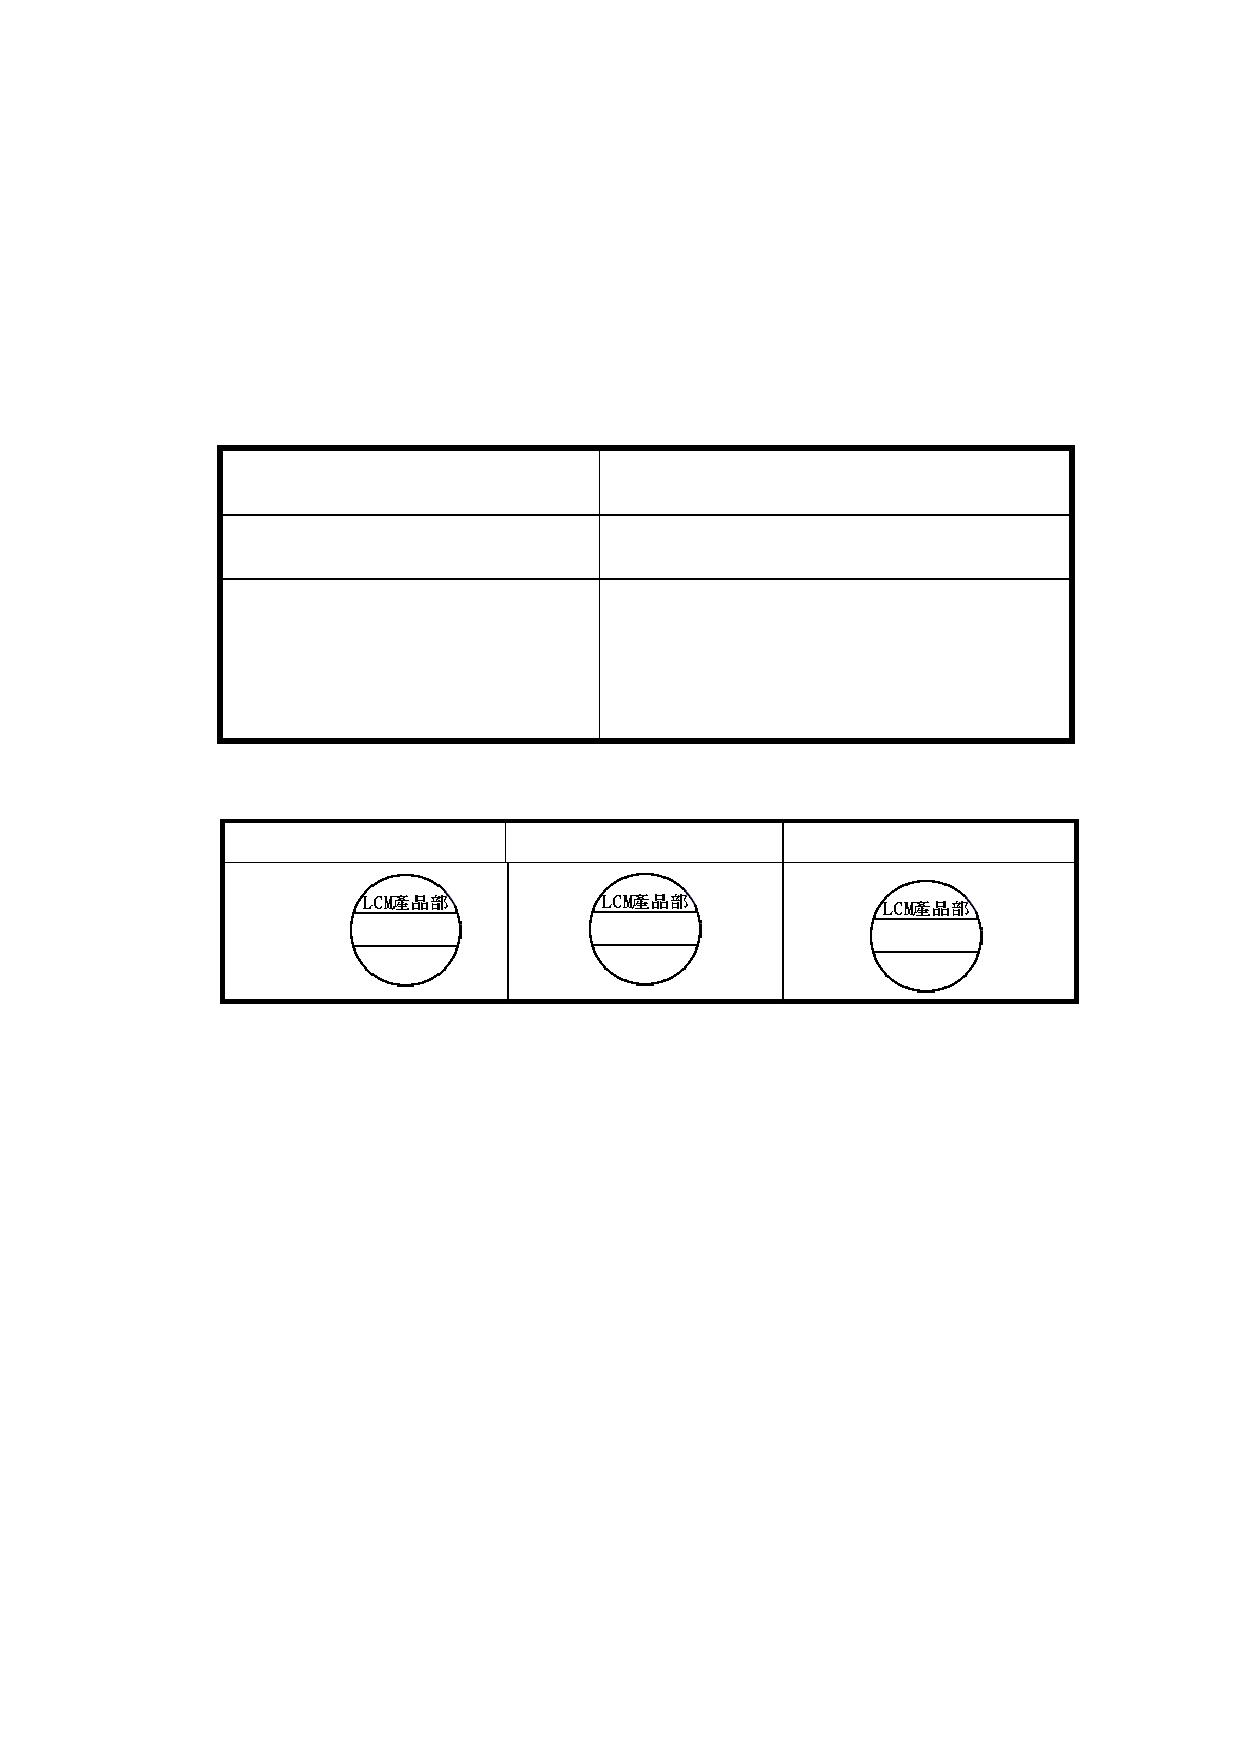 I3507-6HMN3224B datasheet